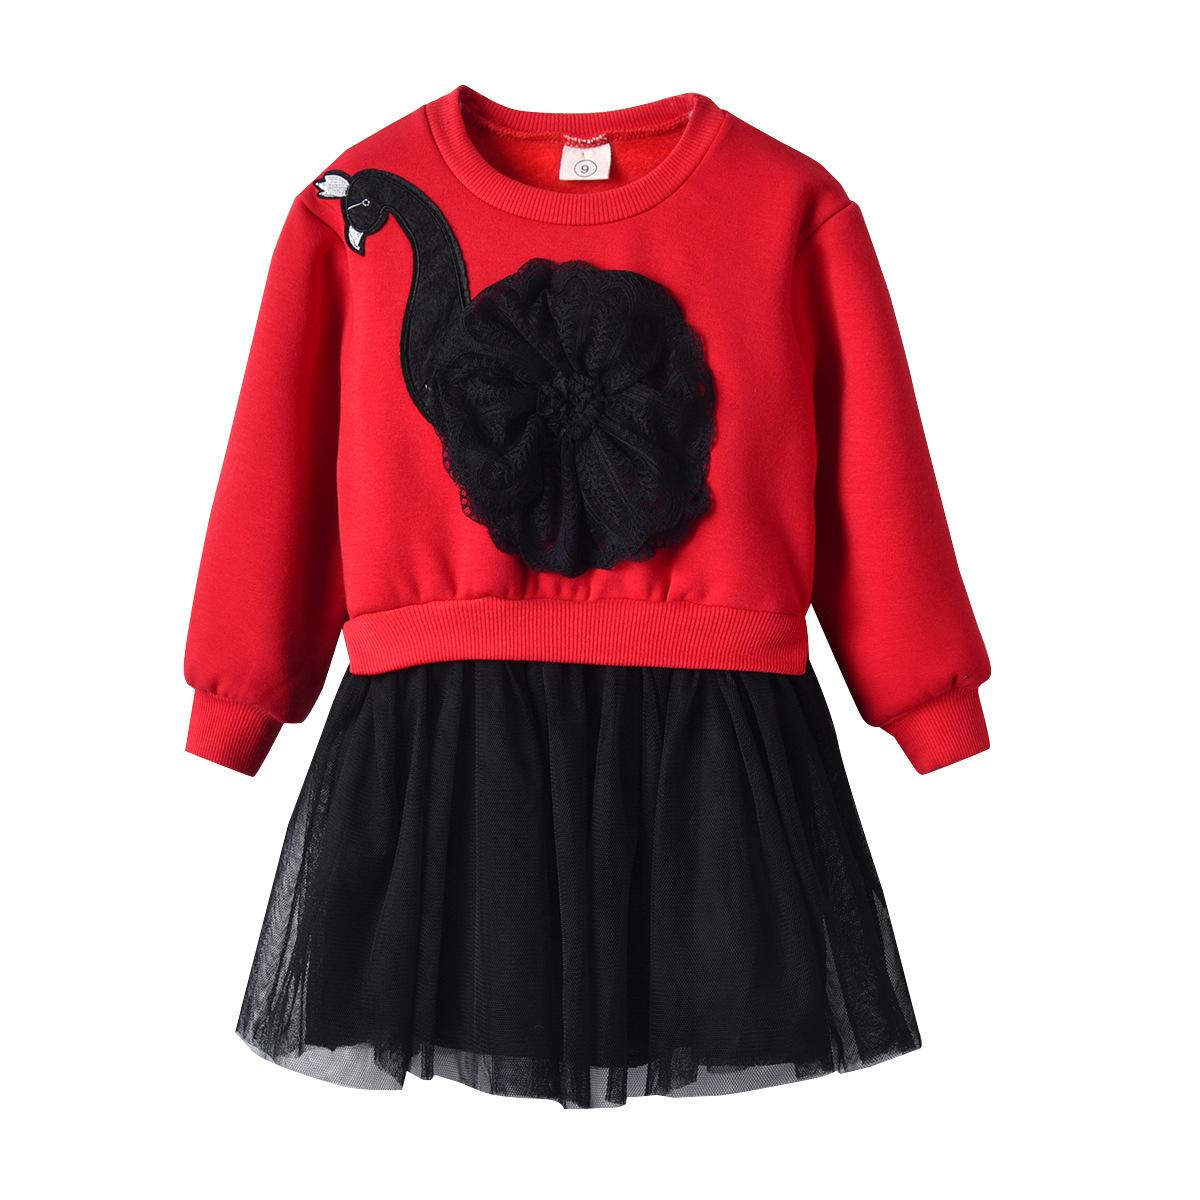 c58738a5fd87 2019 2019 New Foreign Velvet Skirt Girl Korean Version Princess Dress New  Year Red Dress From Cosplayhouse